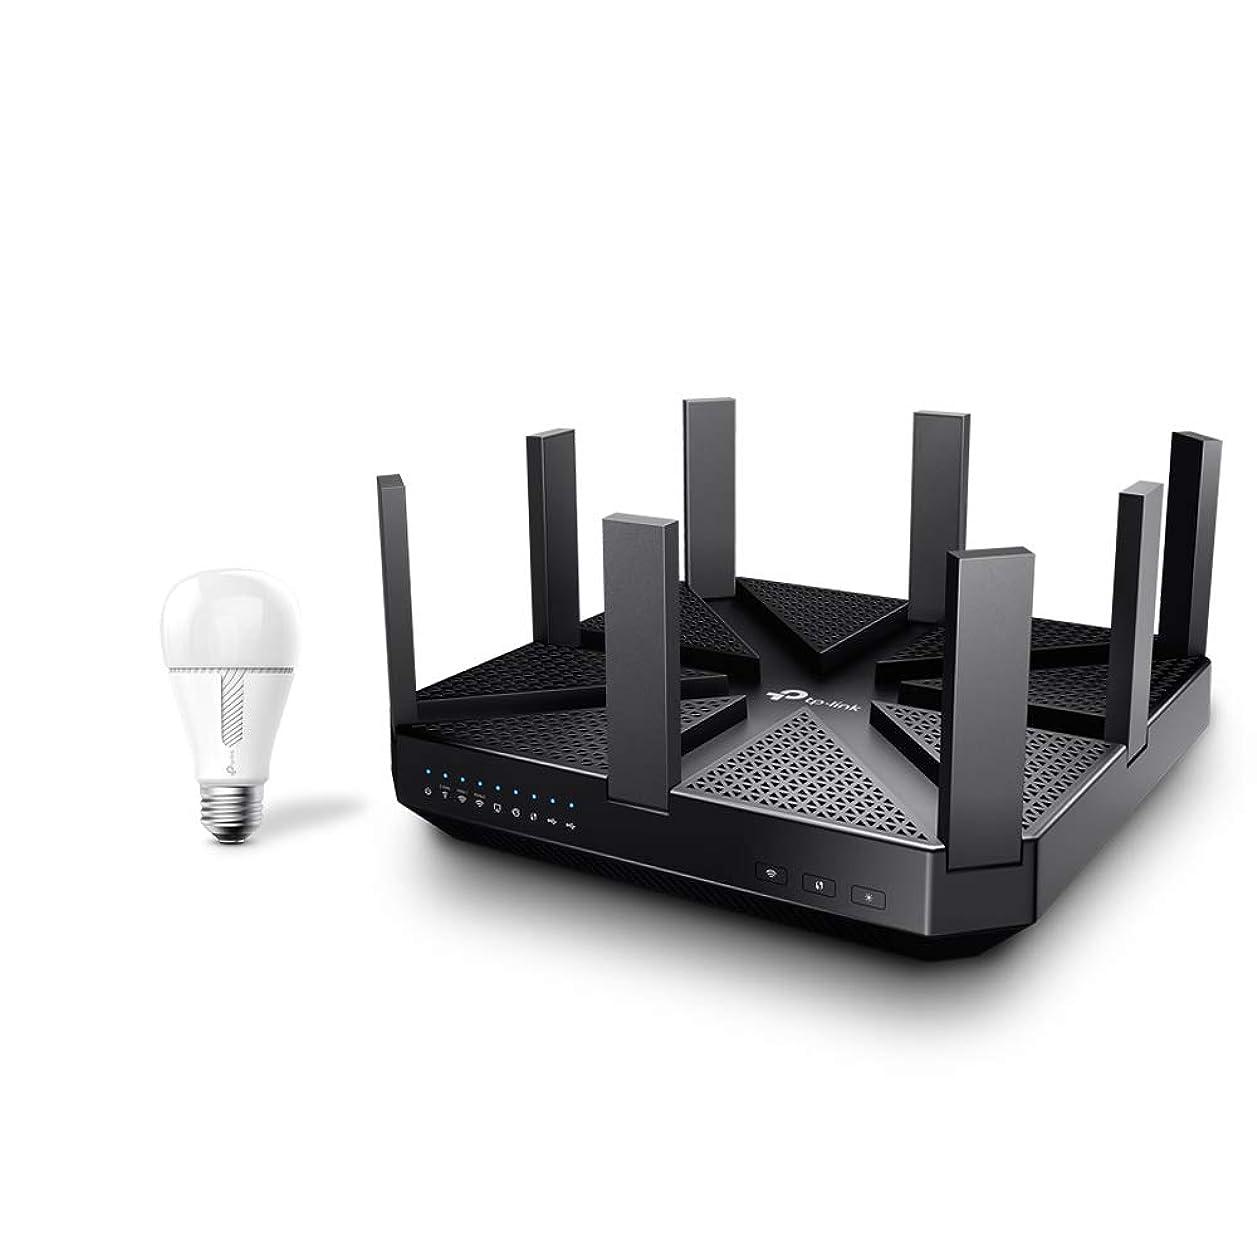 TP-Link WiFi 無線LAN ルーター Archer C5400 AC5400 2167+2167+1000Mbps トライバンド + TP-Link Kasa スマート LED ランプ 調光タイプ E26 KL110 800lm 電球色